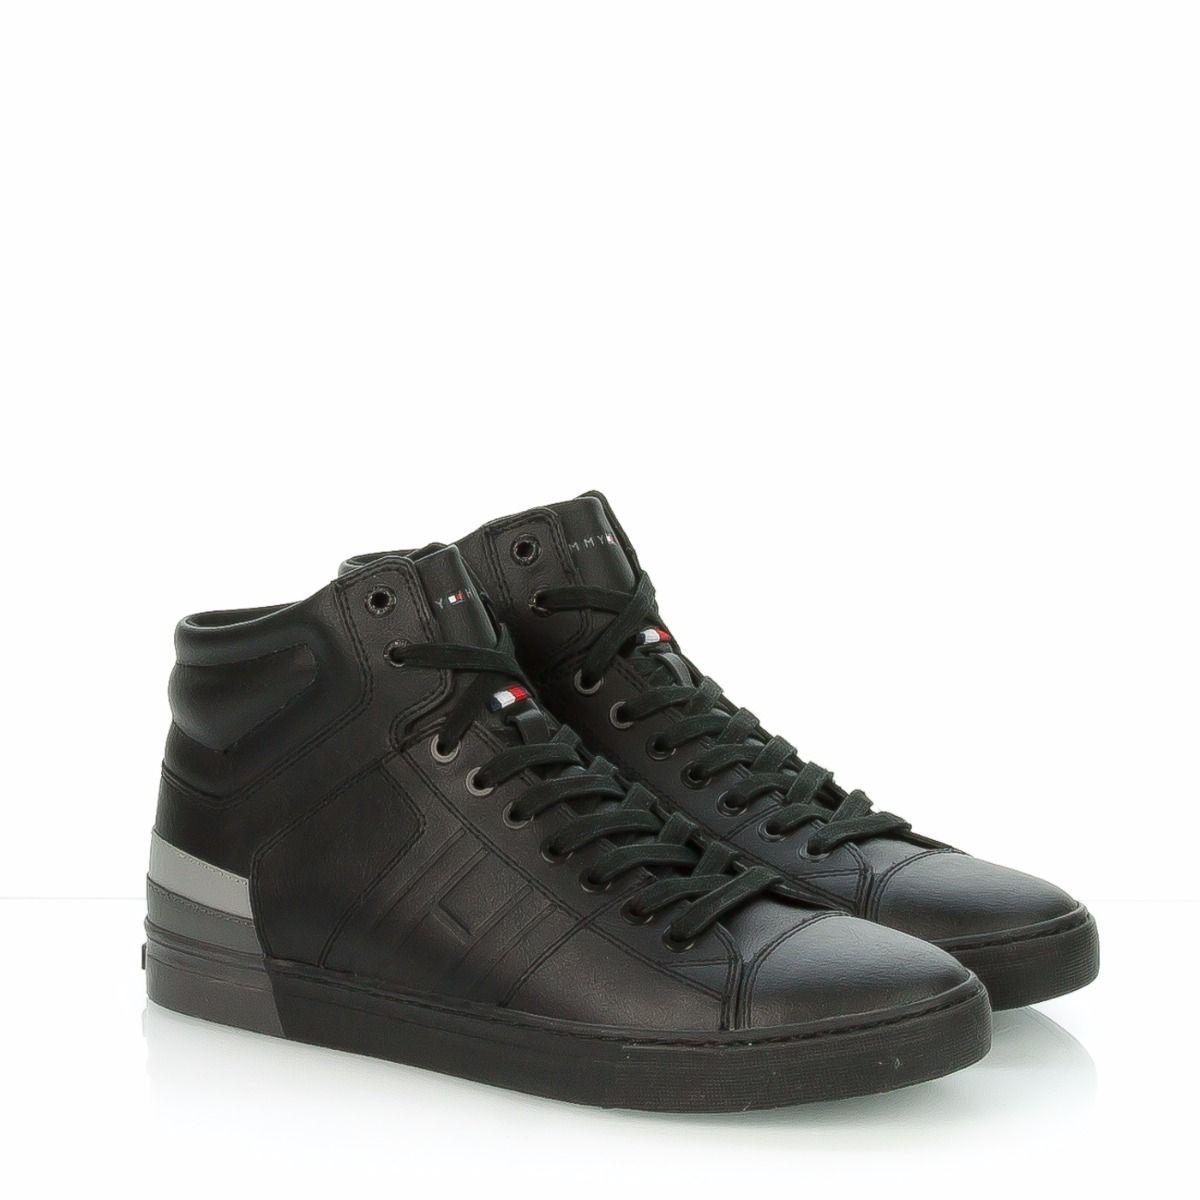 TOMMY HILFIGER JAY|sneakers alta uomo|FM0FM00912 990|pelle